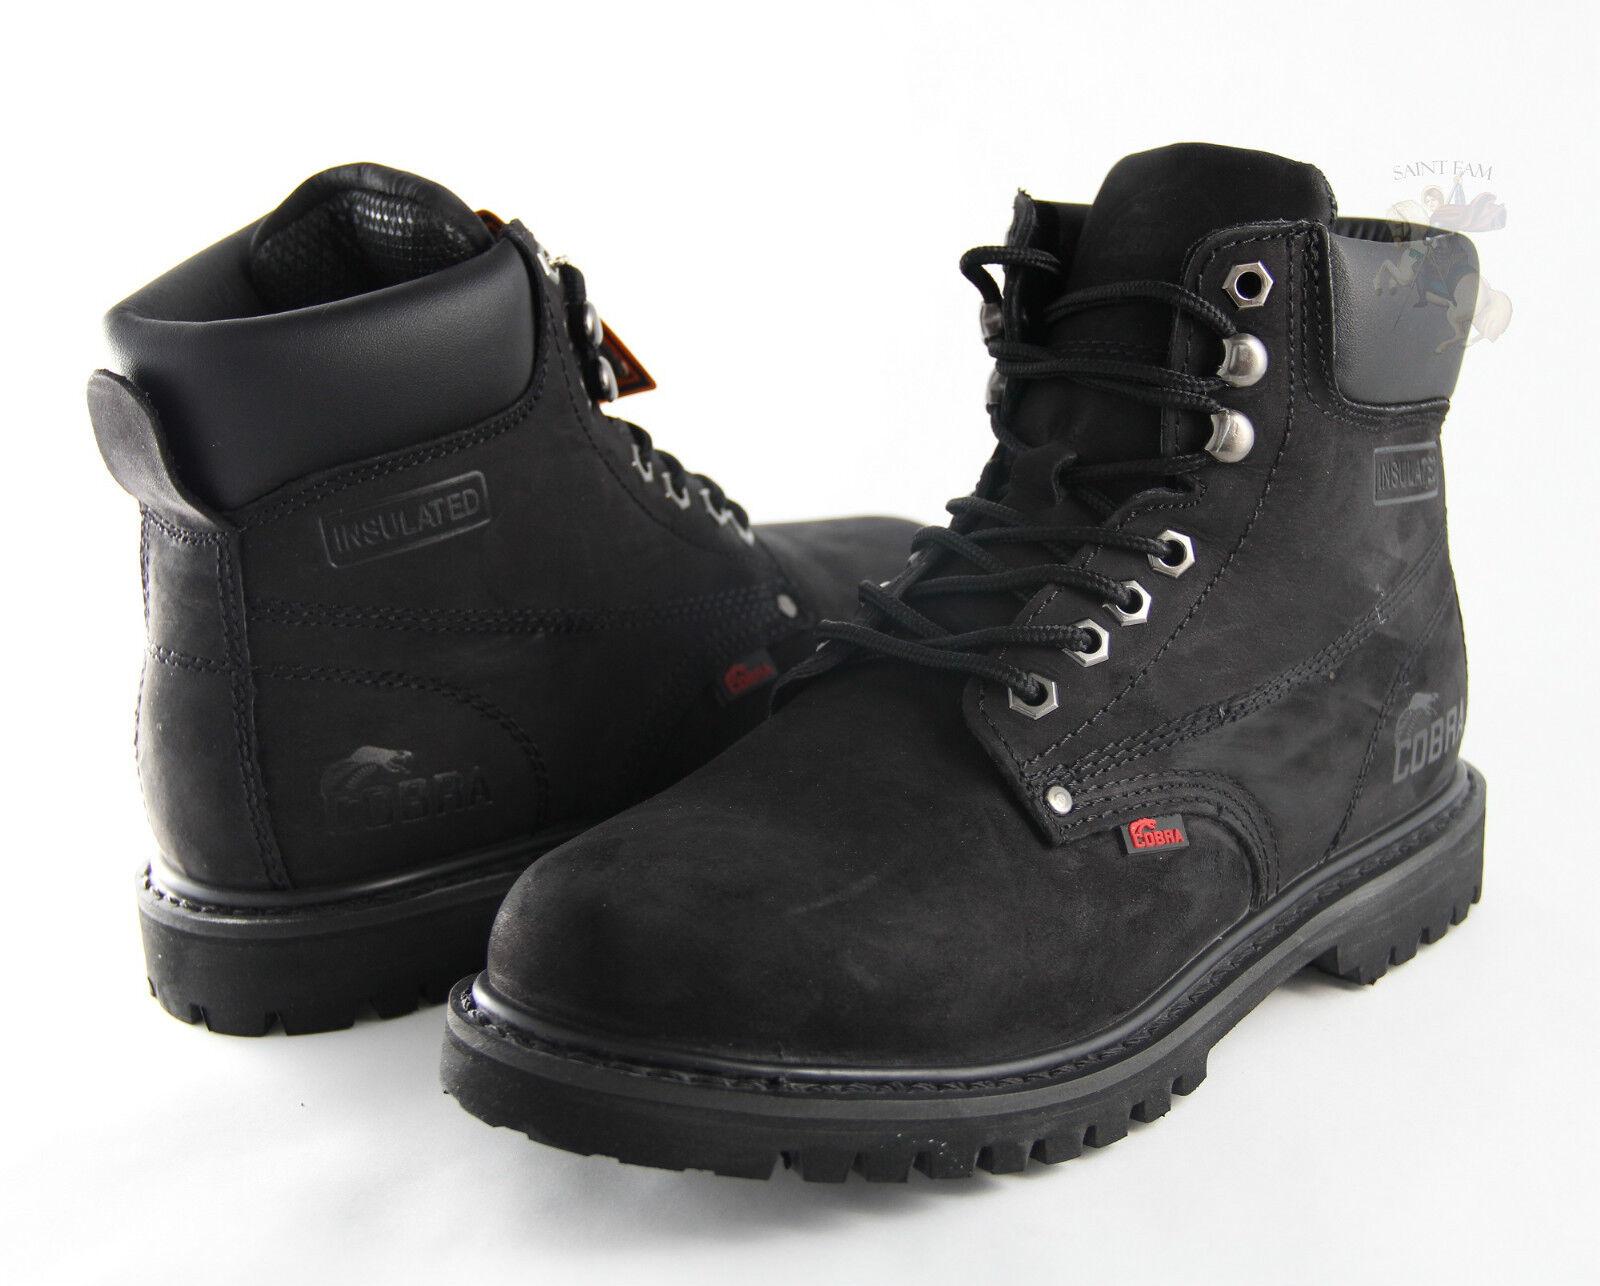 Men Work Boot Cobra Steel Toe C11S Black Genuine Leather Welt Construction New